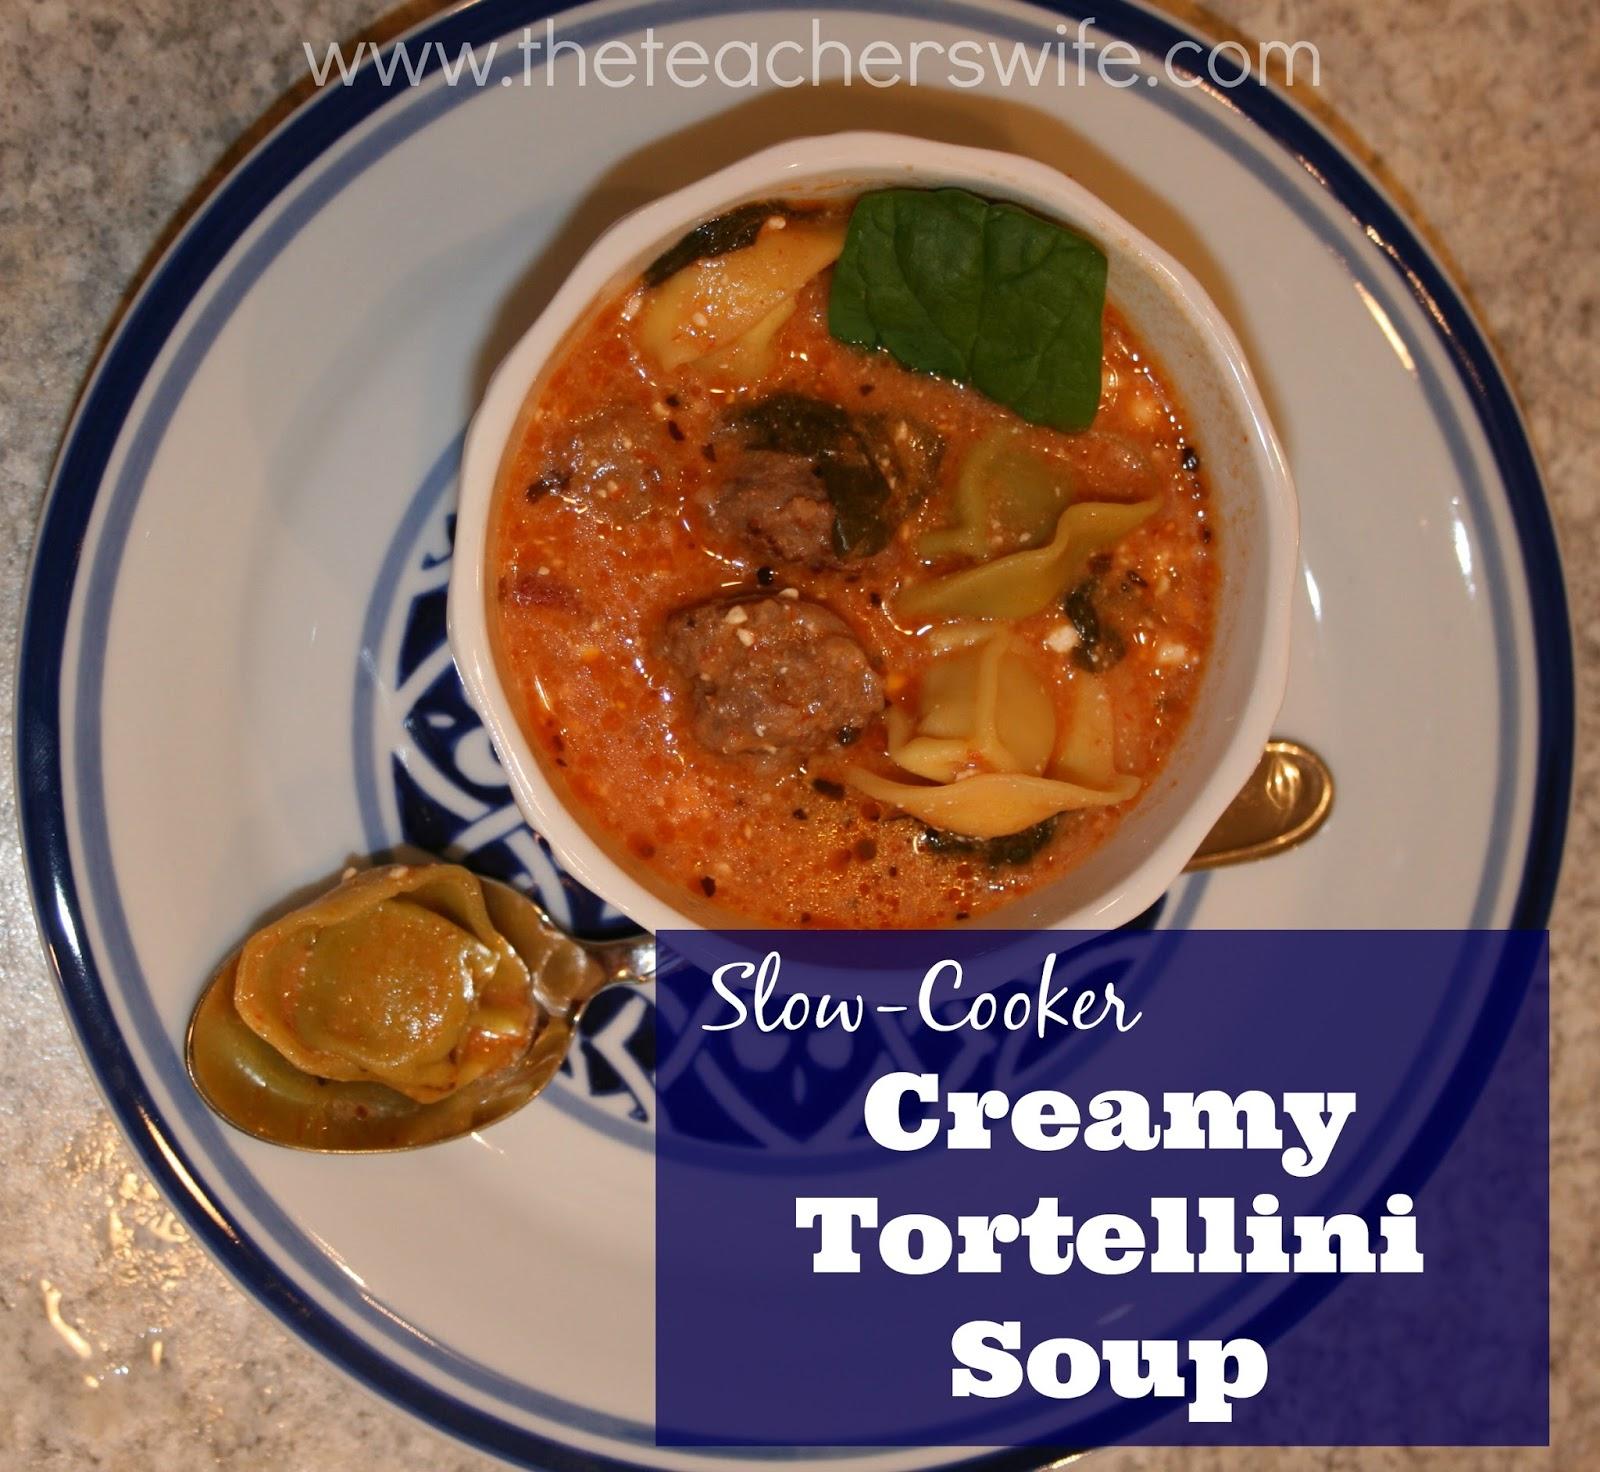 Slow Cooker Creamy Tortellini Soup Recipe: Slow-Cooker Creamy Tortellini Soup